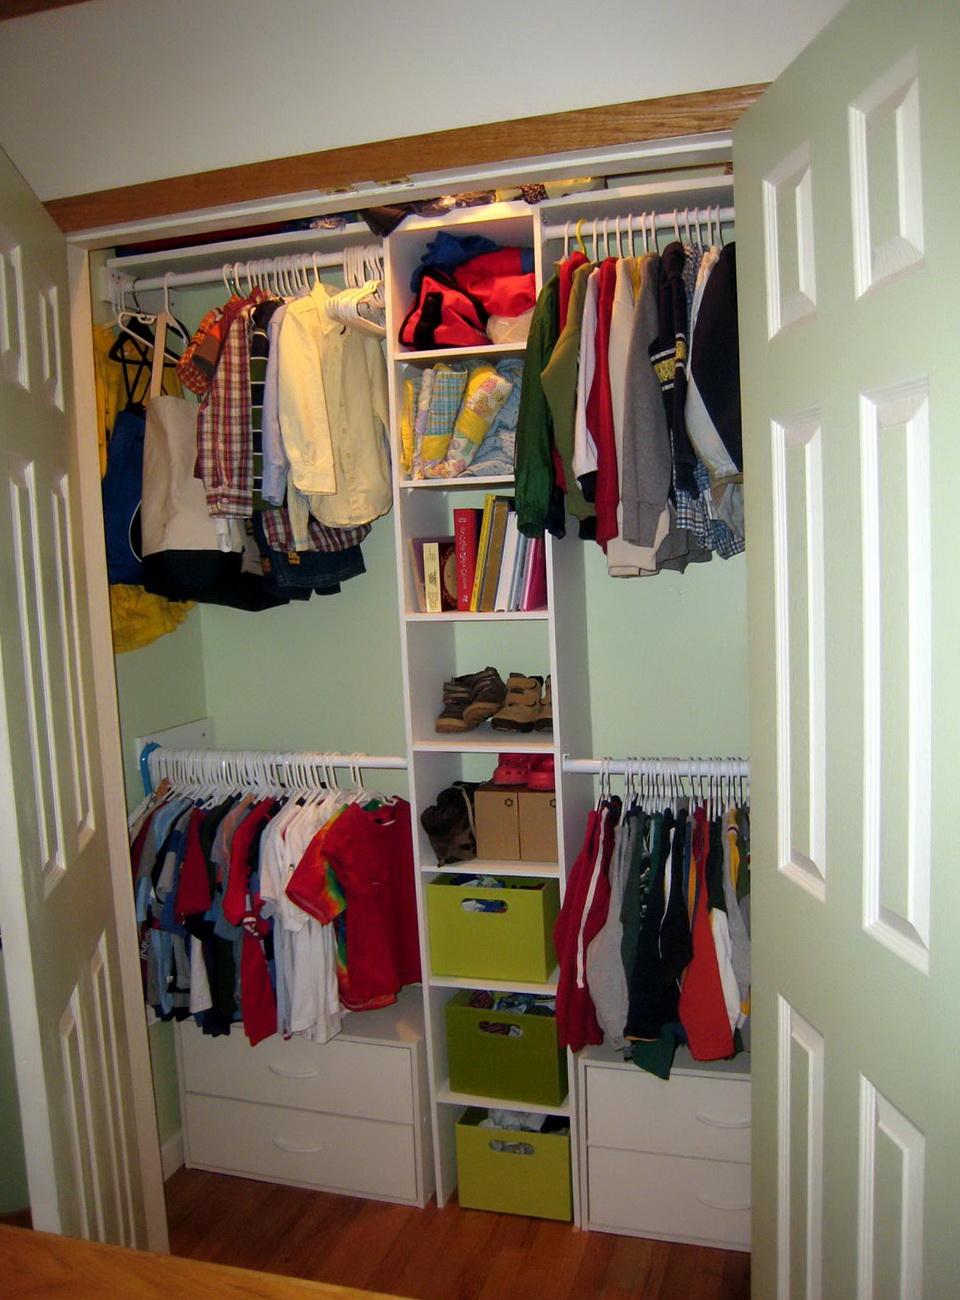 Mainstays Double Hanging Closet Organizer Instructions